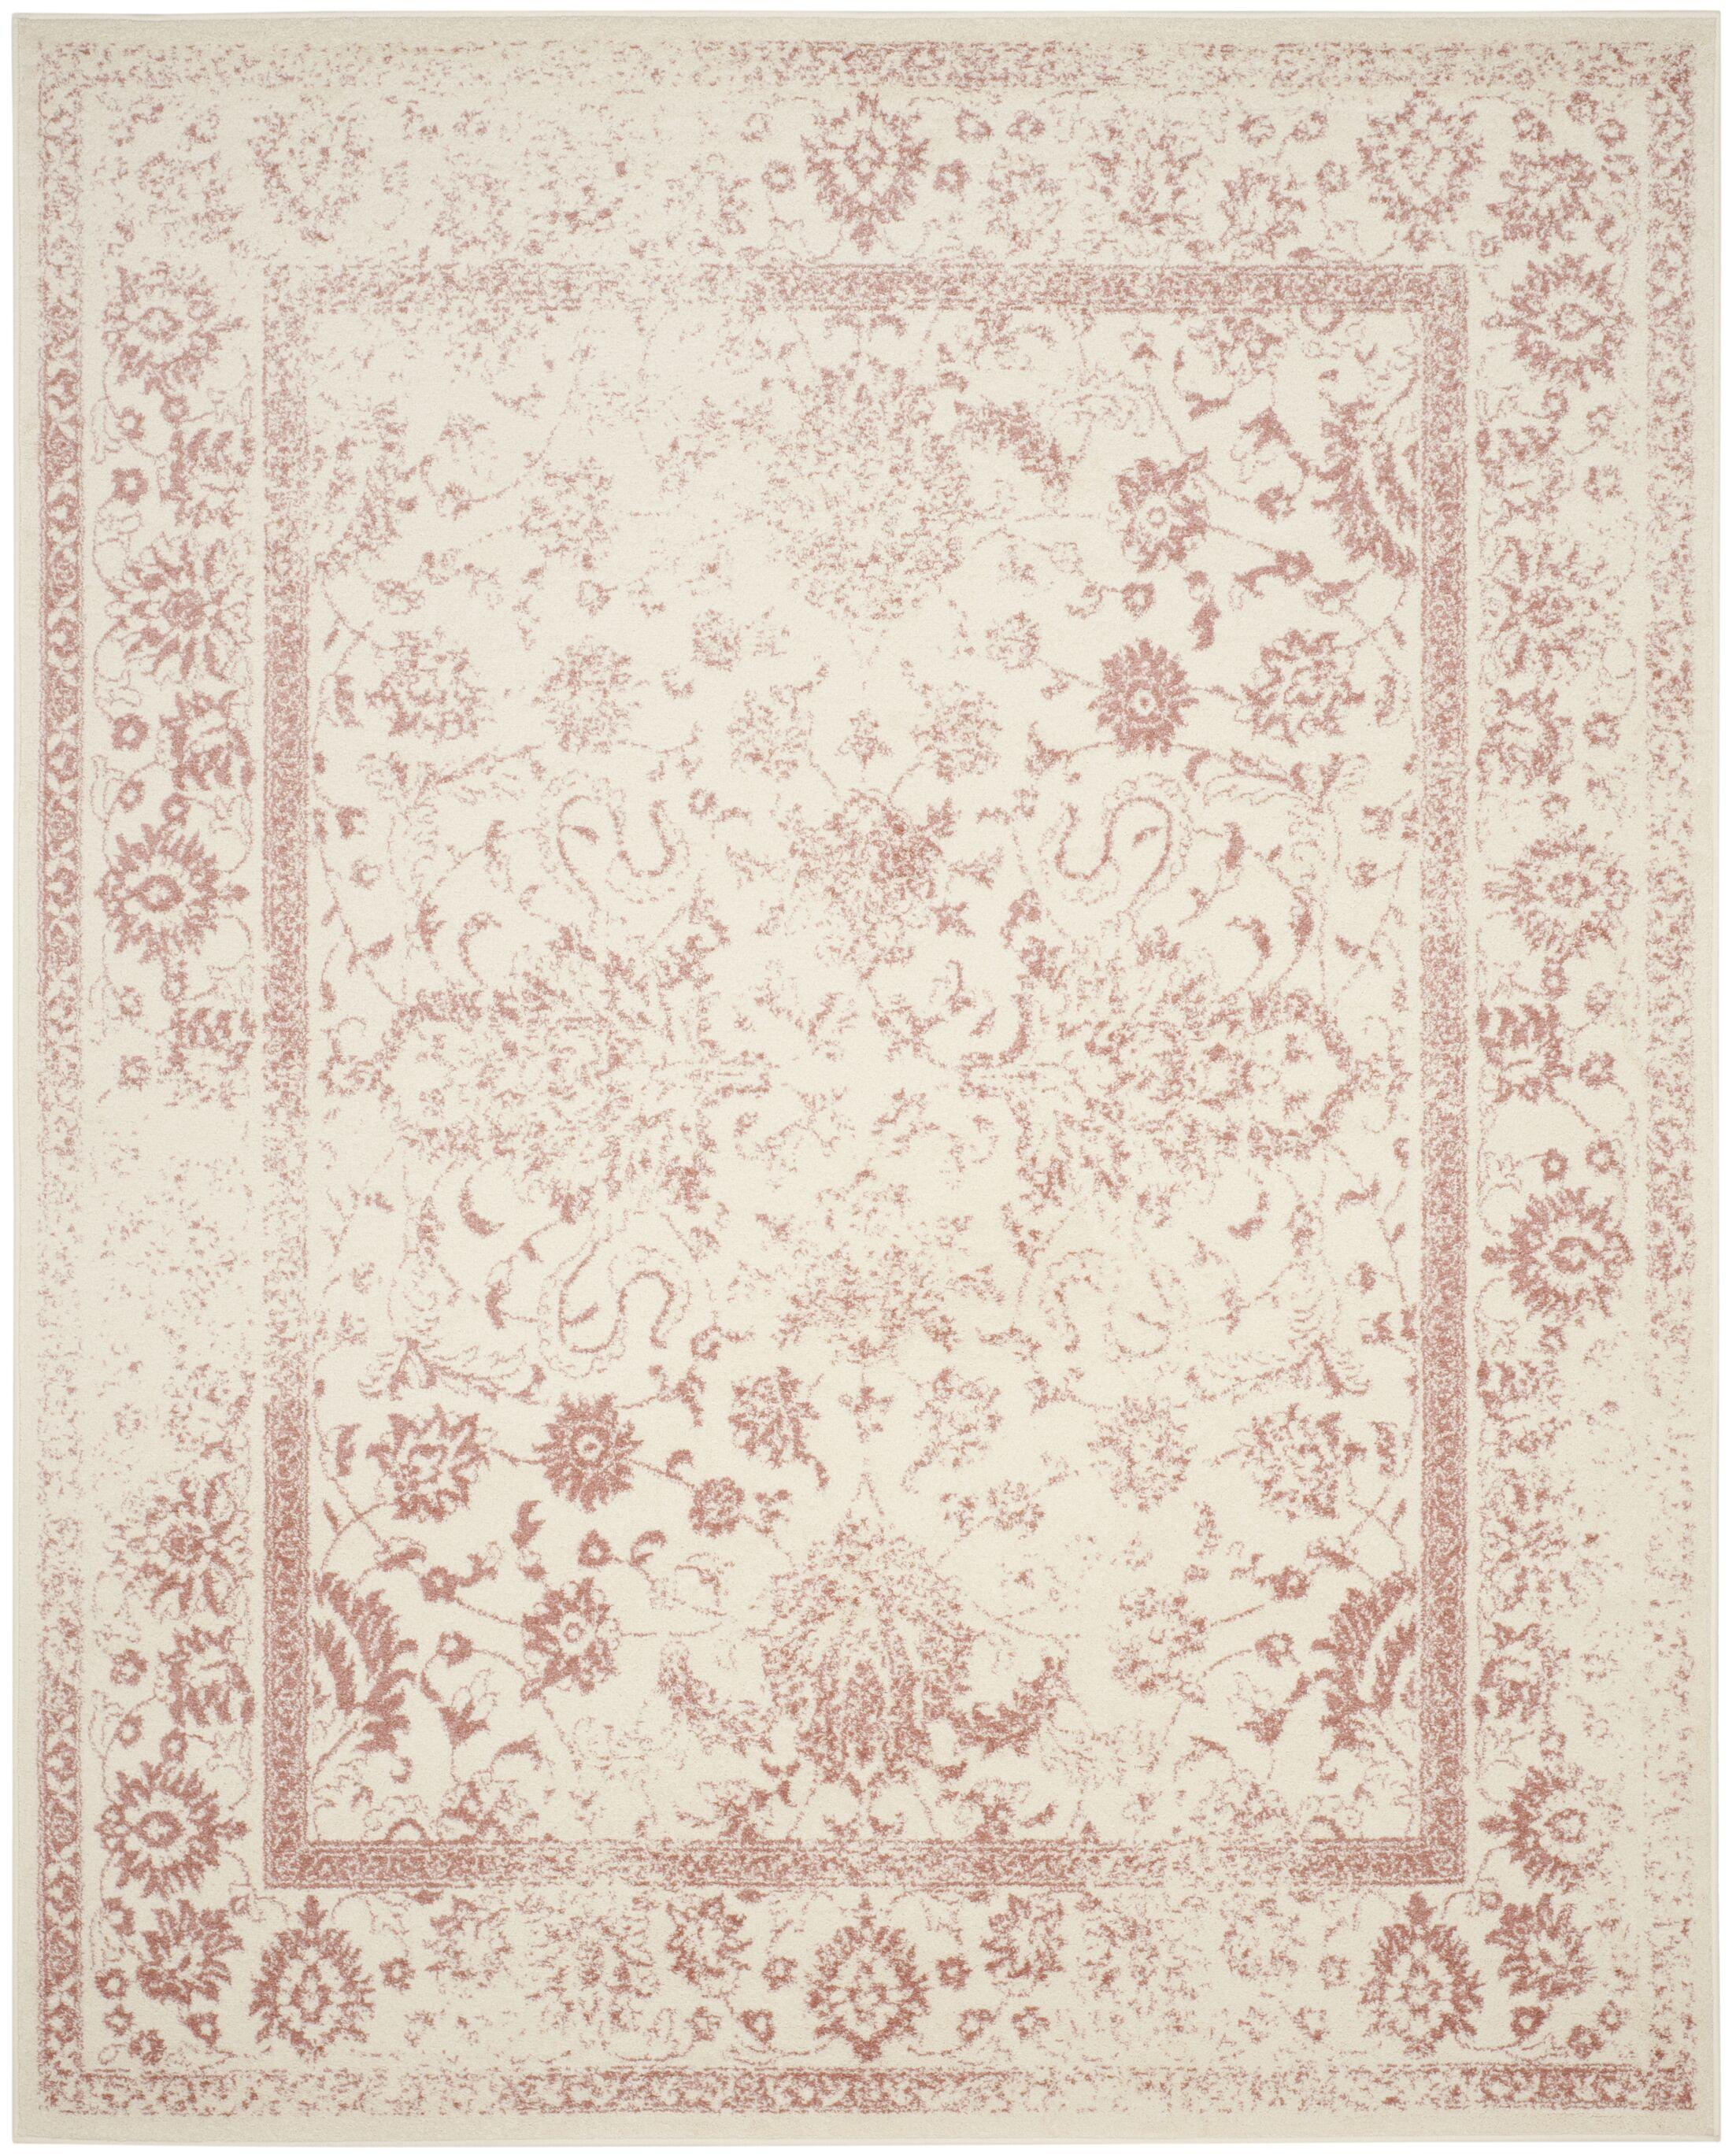 Howton Ivory/Rose Area Rug Rug Size: Rectangle 10' x 14'